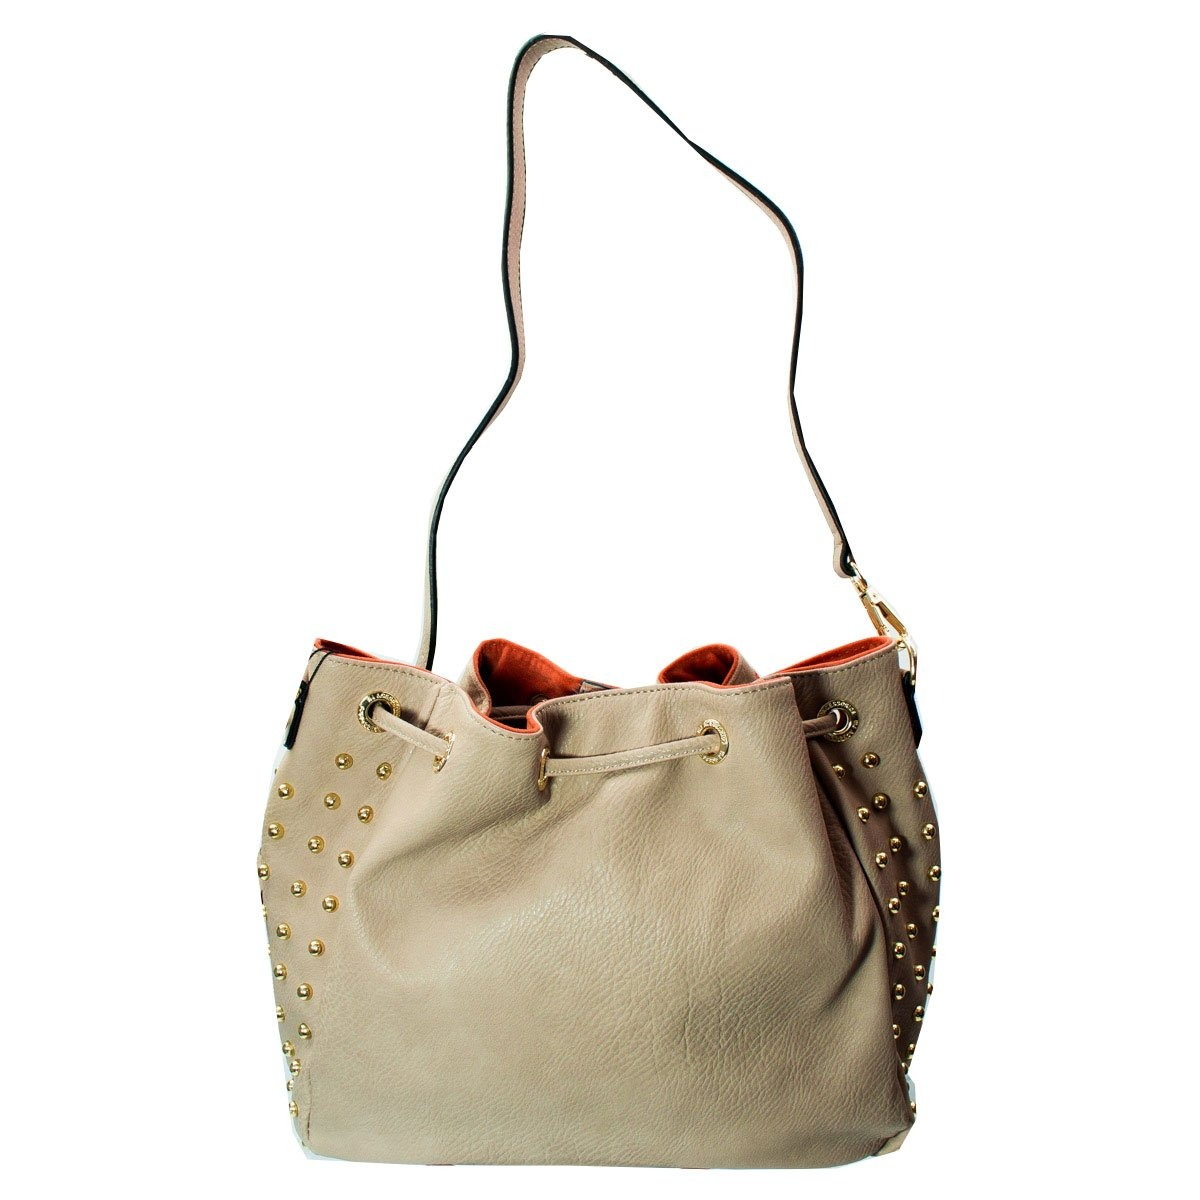 ddbb5edfb Bolsa Saco Feminina Wj Bordado Grande 44352 - R$ 309,90 em Mercado Livre